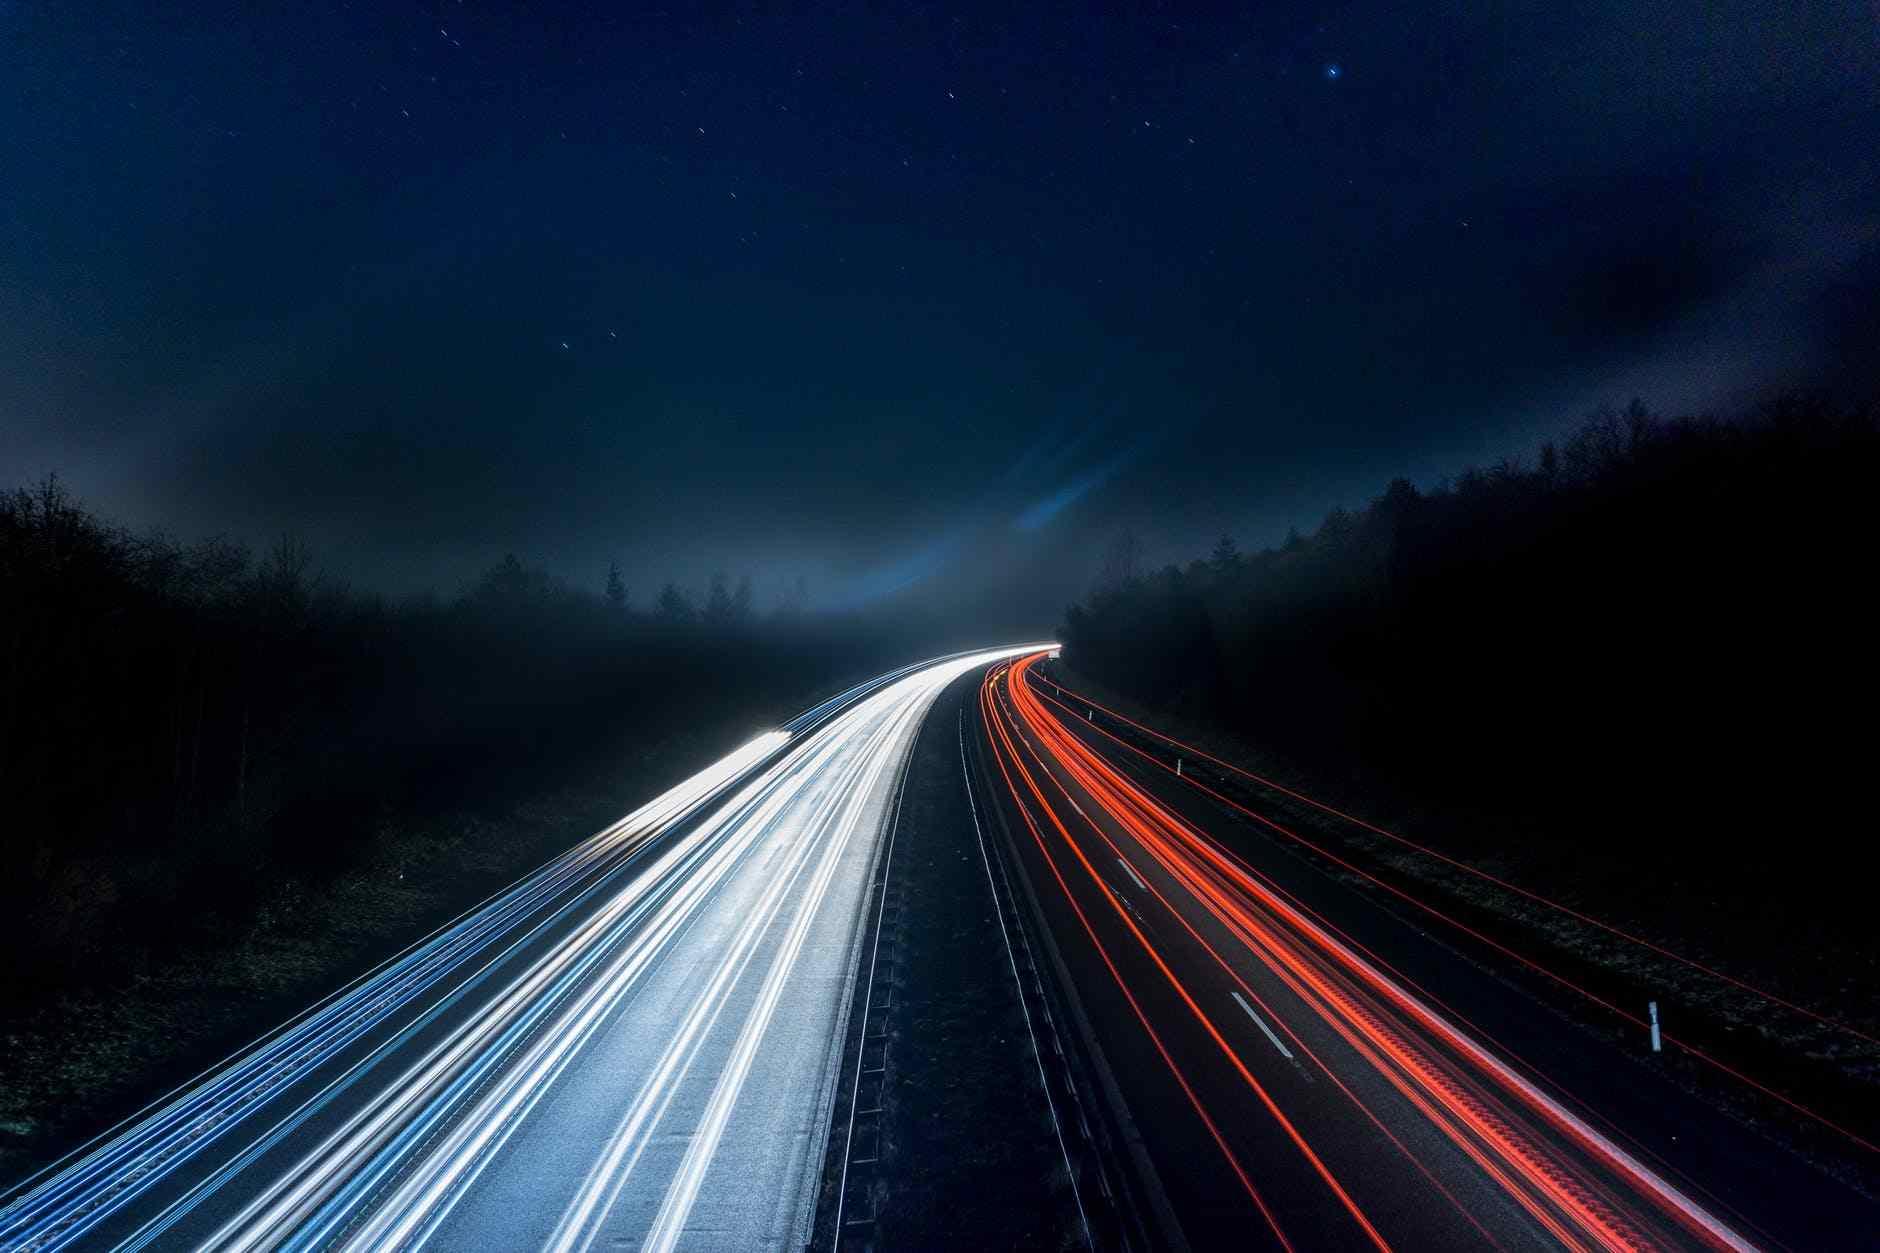 Panduan Penggunaan Shutter Speed untuk Fotografer Pemula